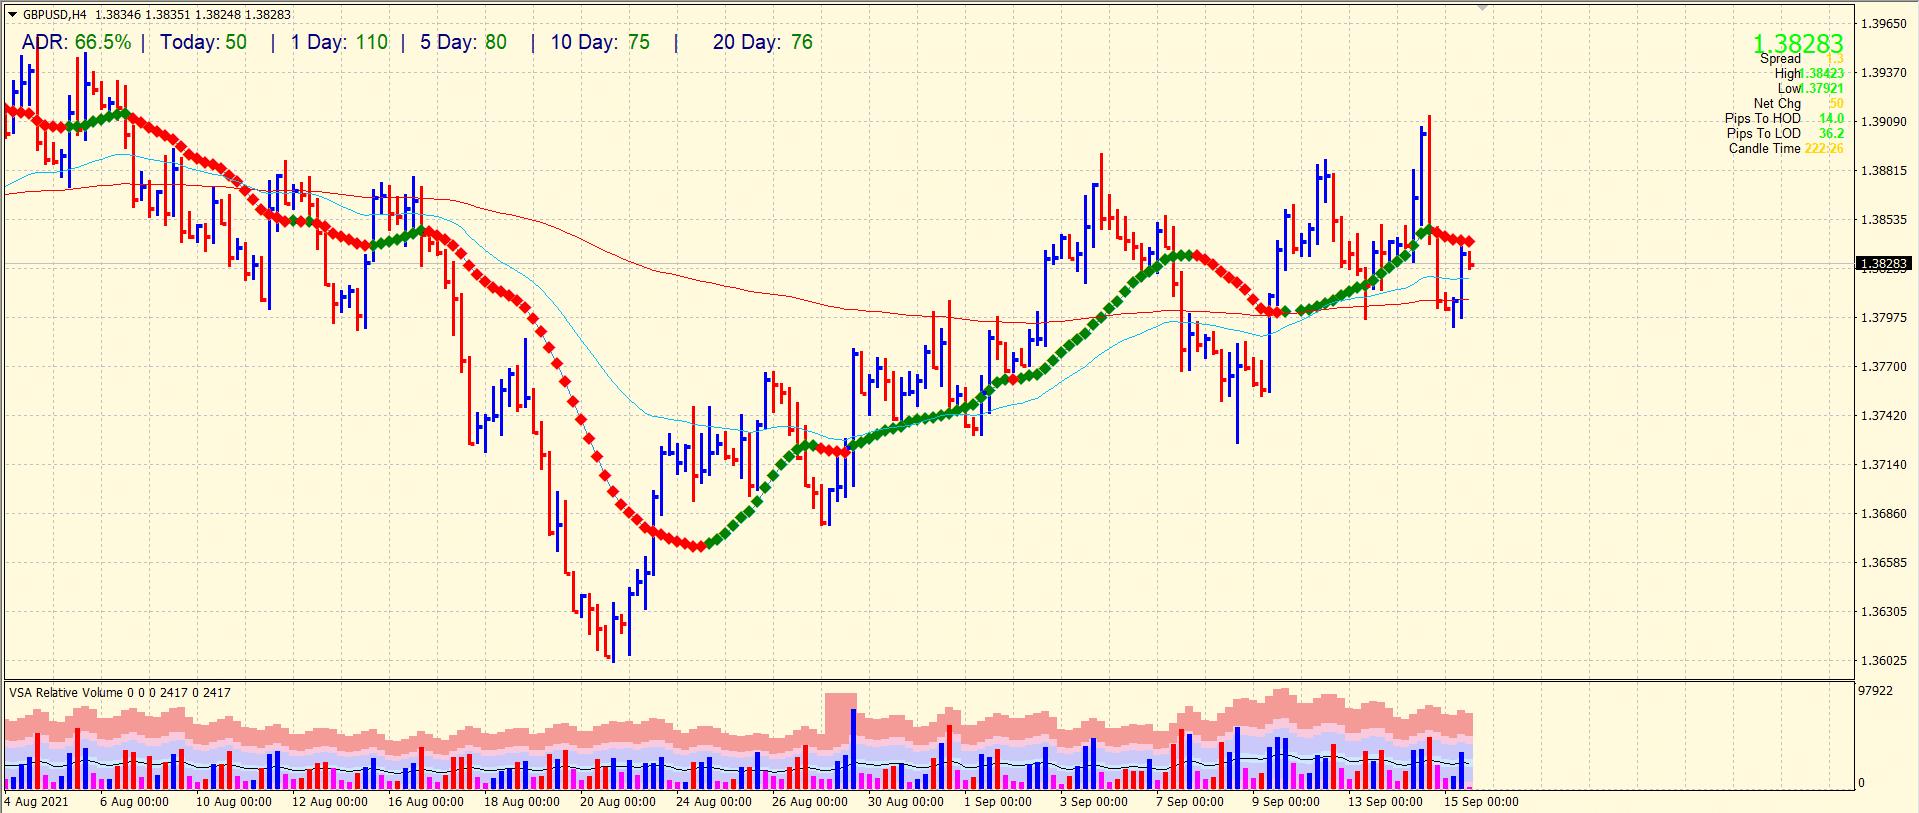 GBP/USD 4-hour price forecast